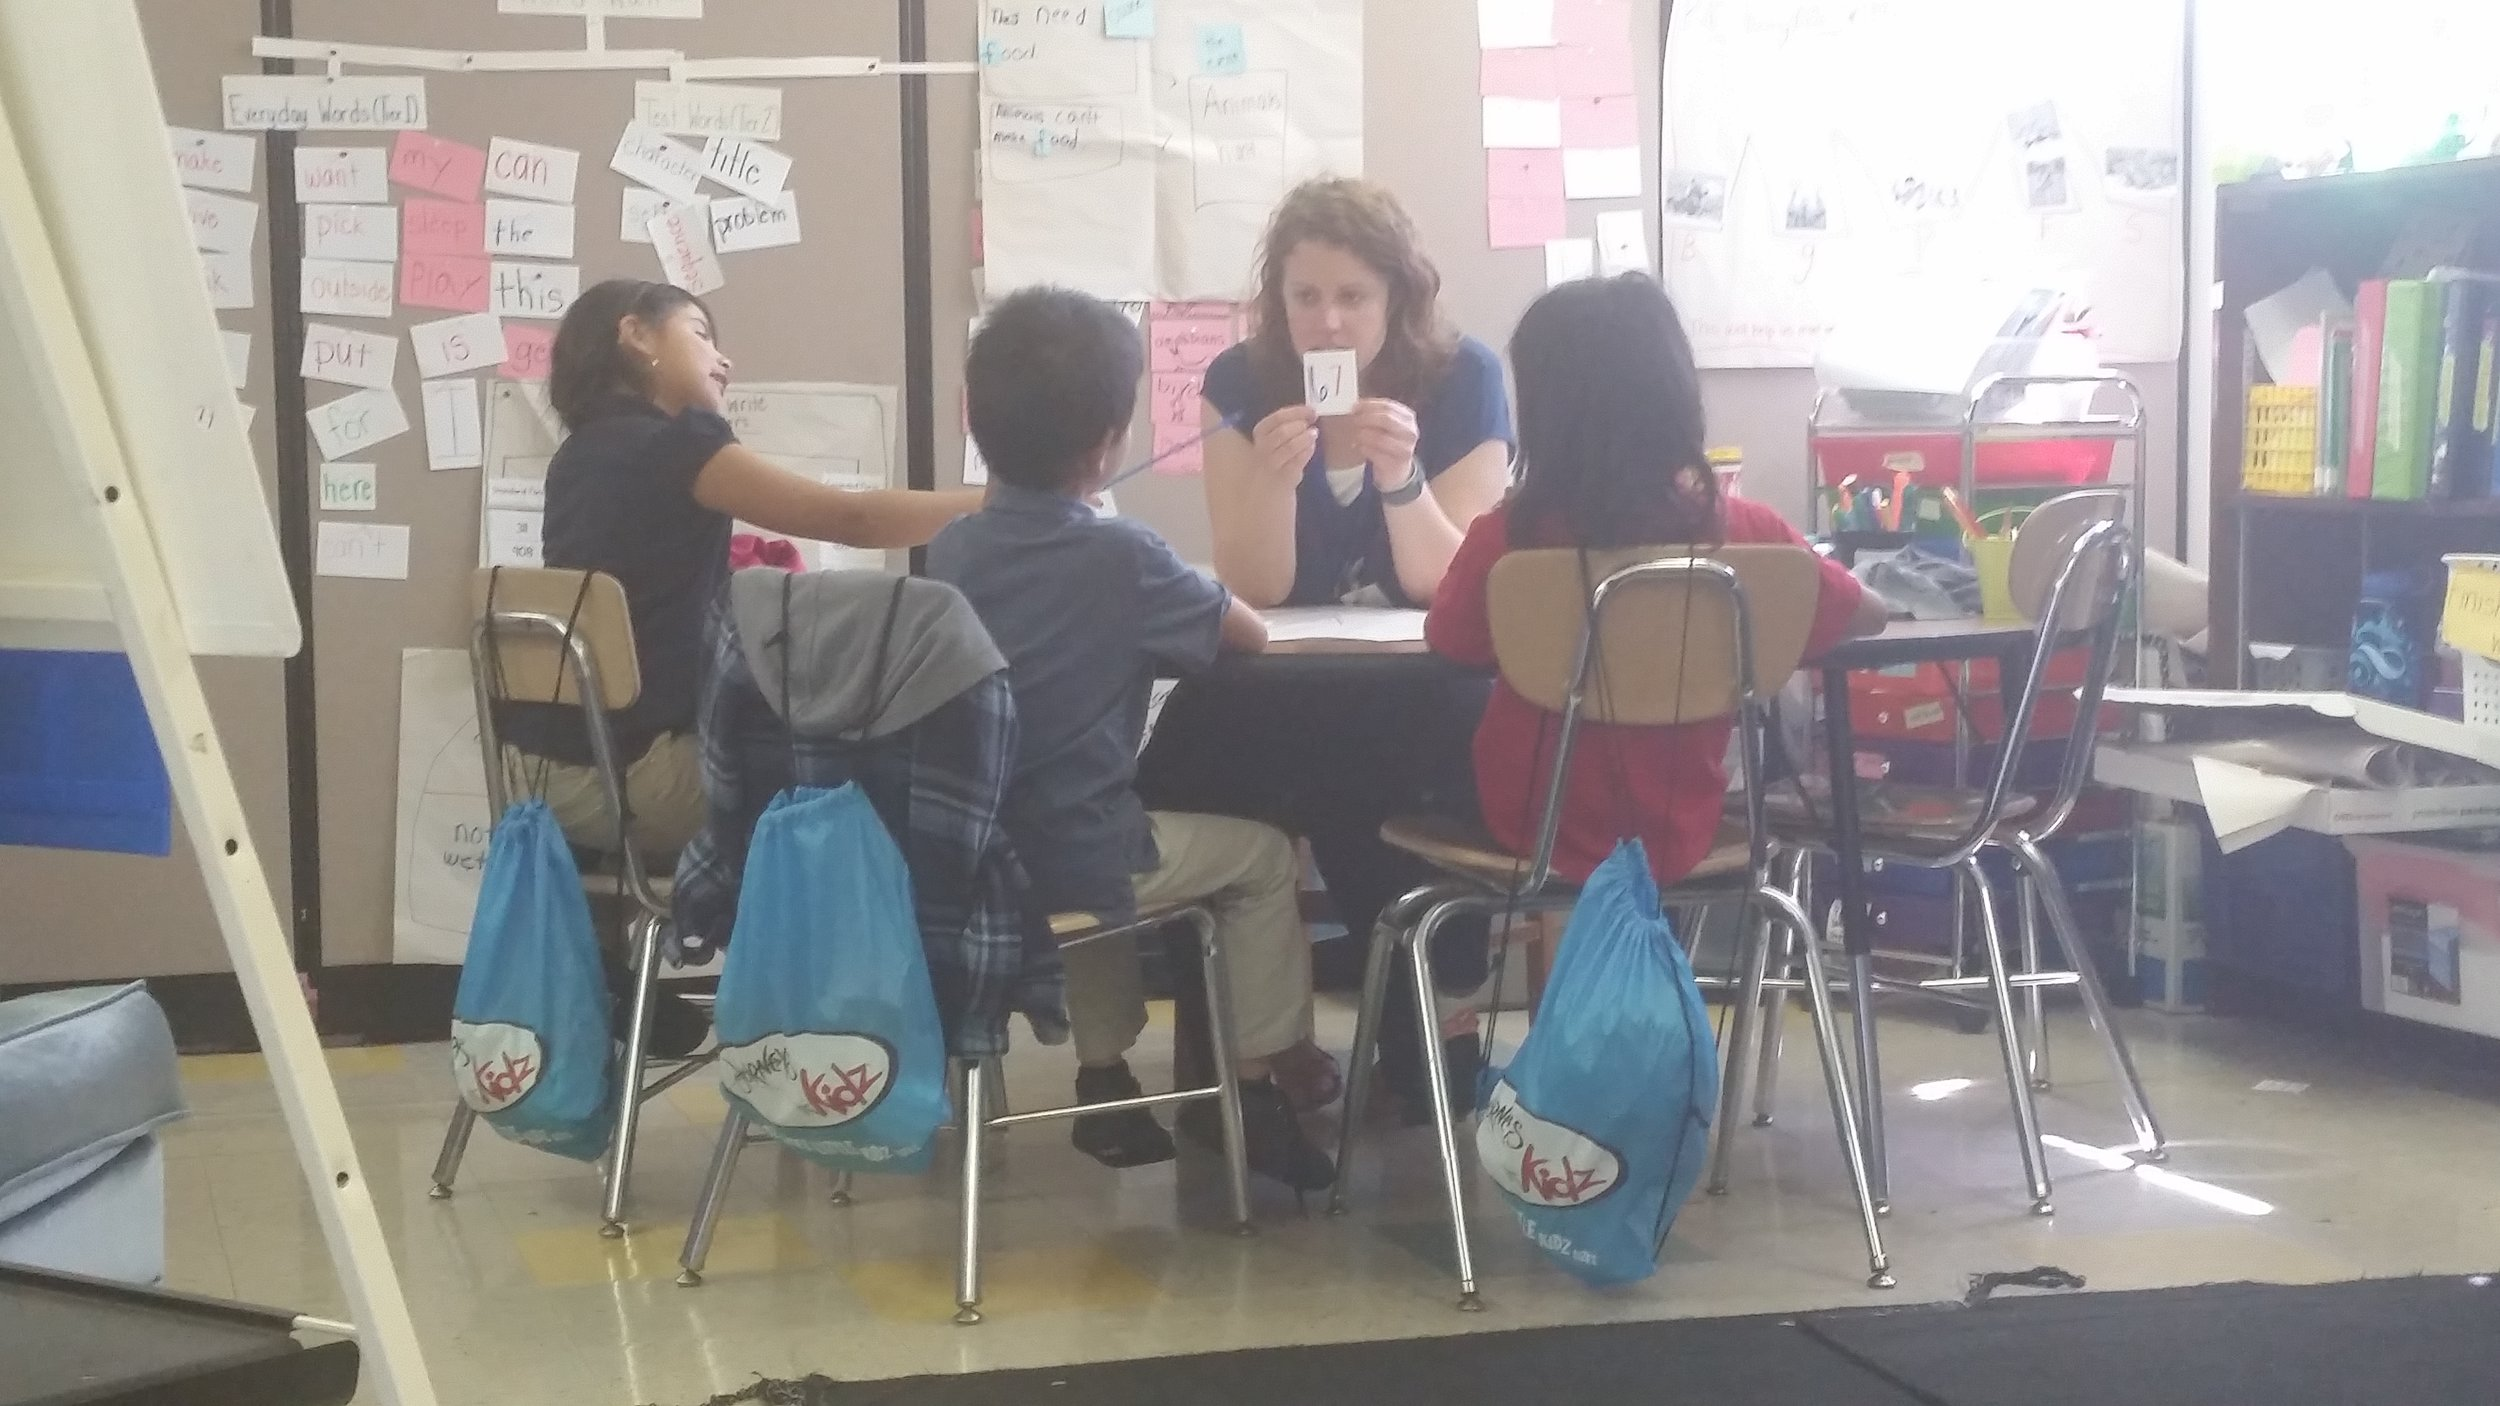 MsConfer's classroom2